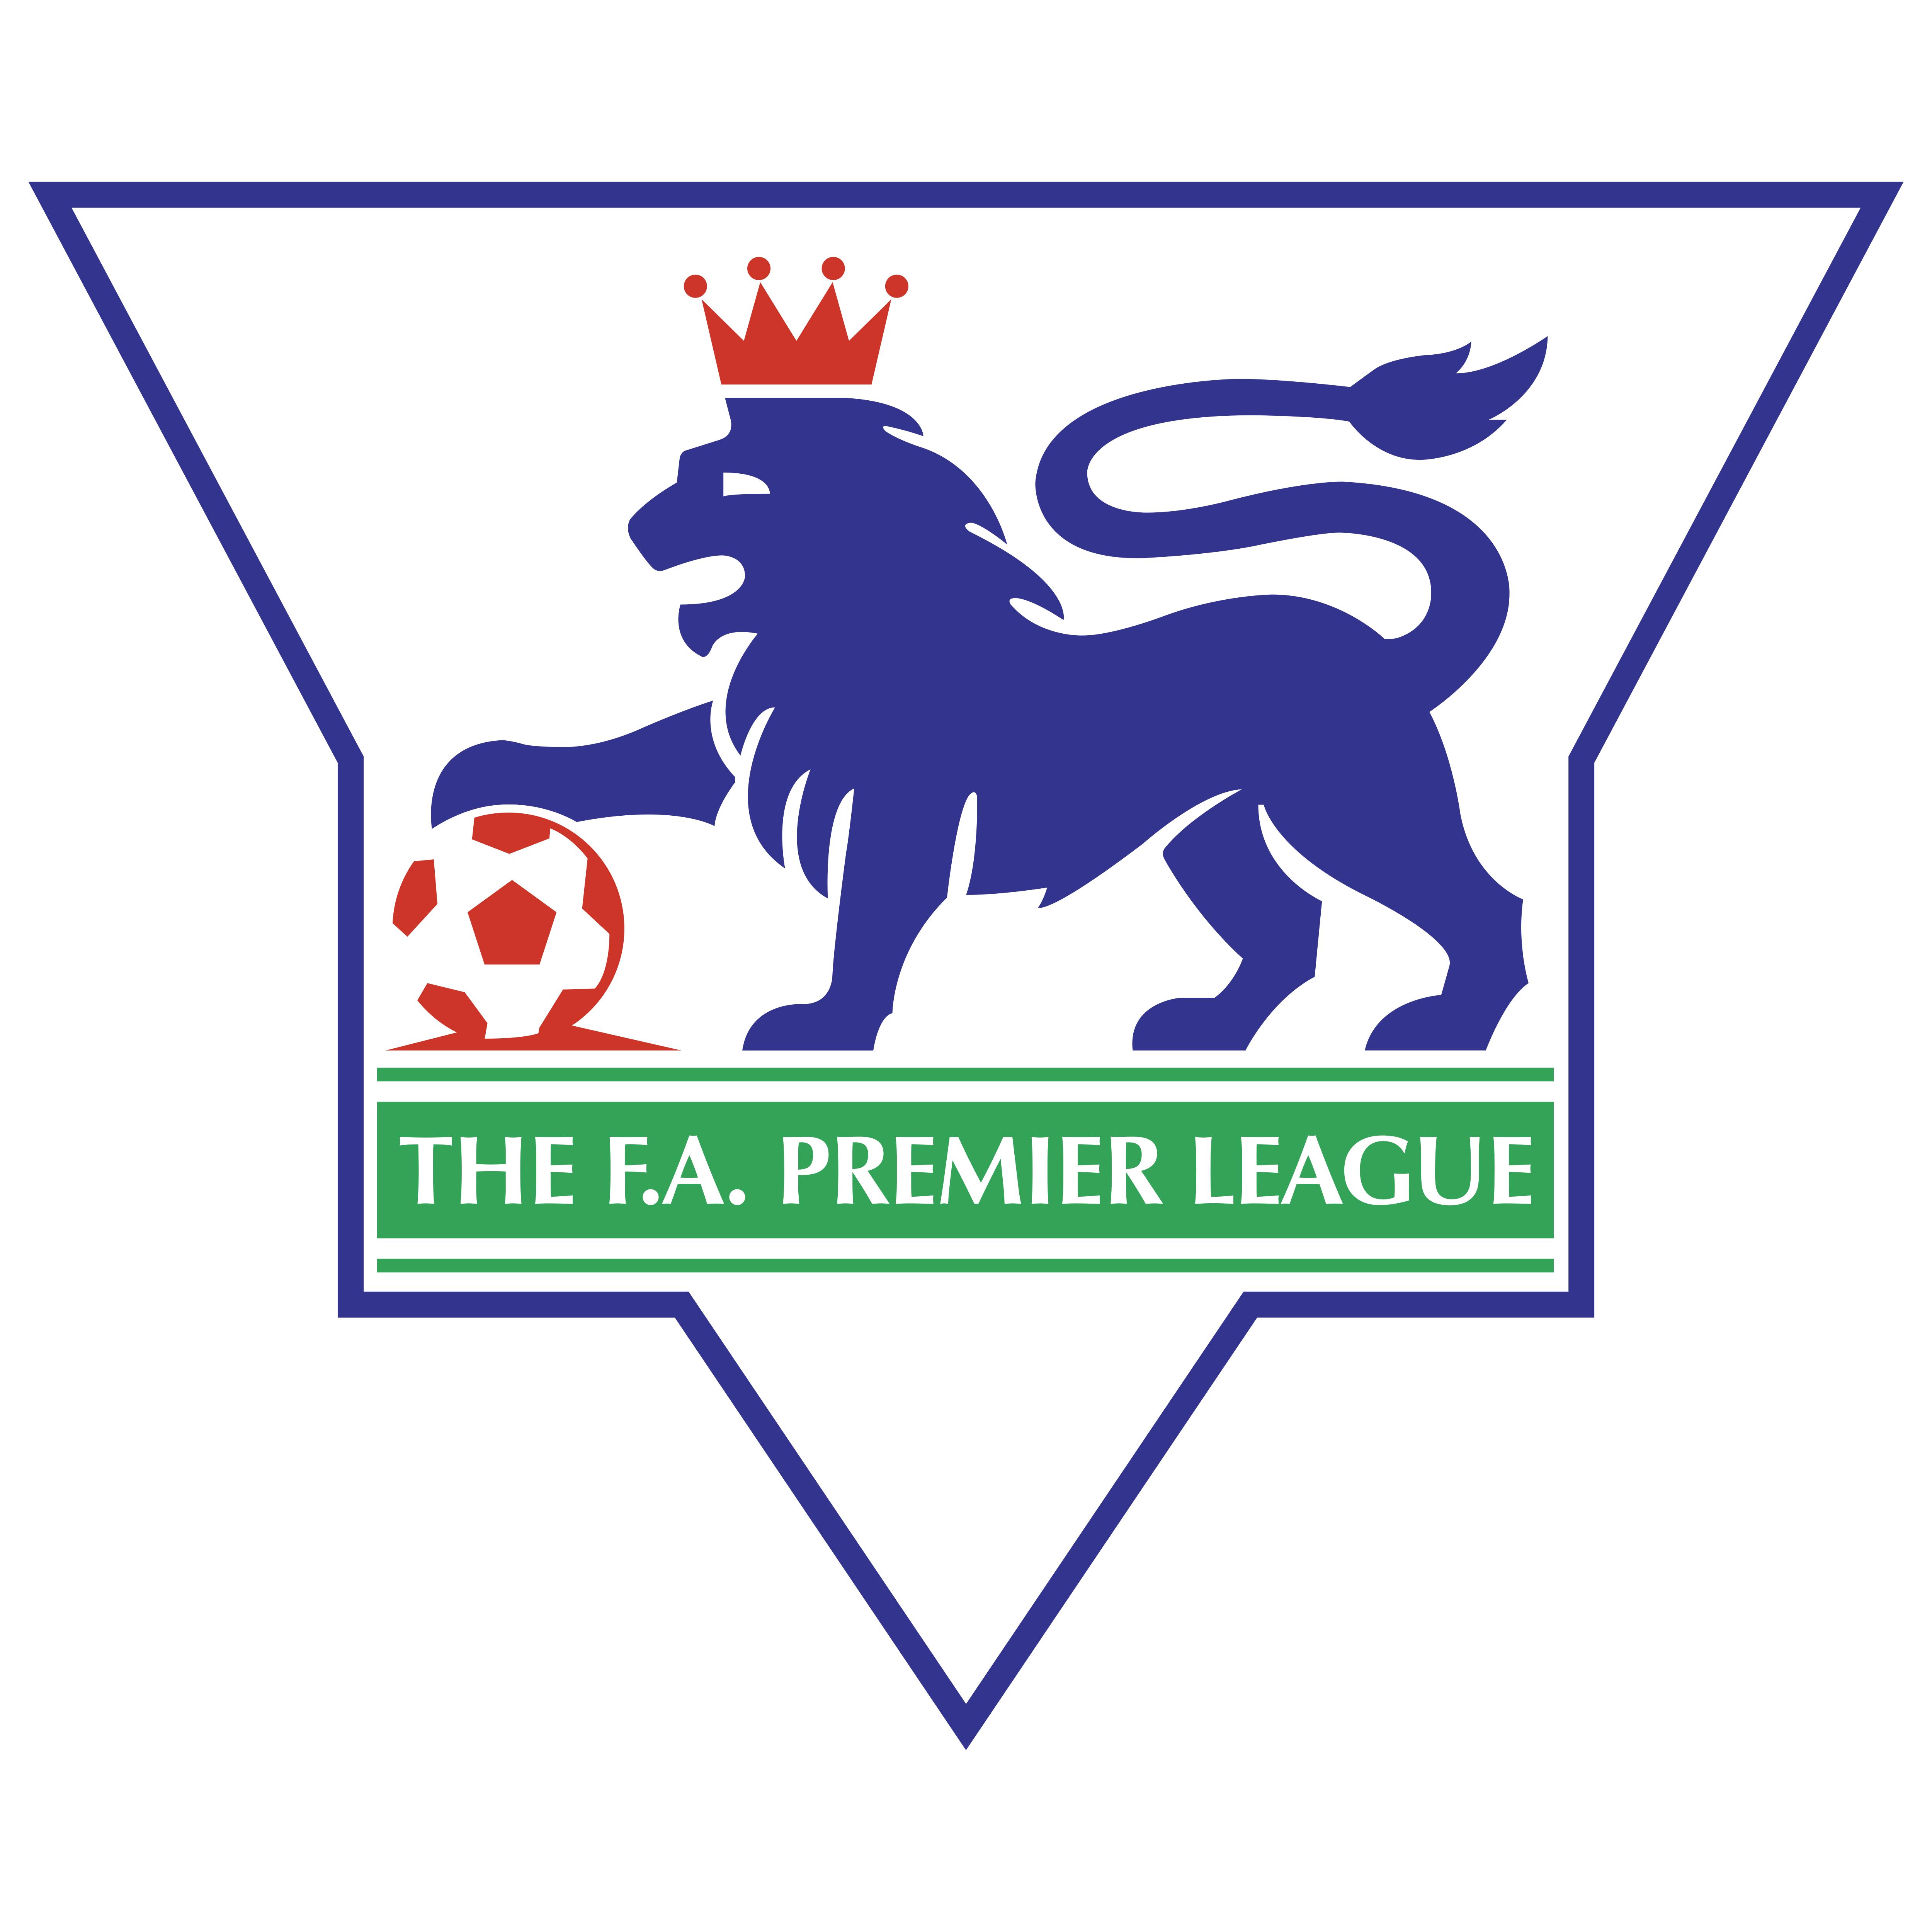 FA Premier League - Logos Download